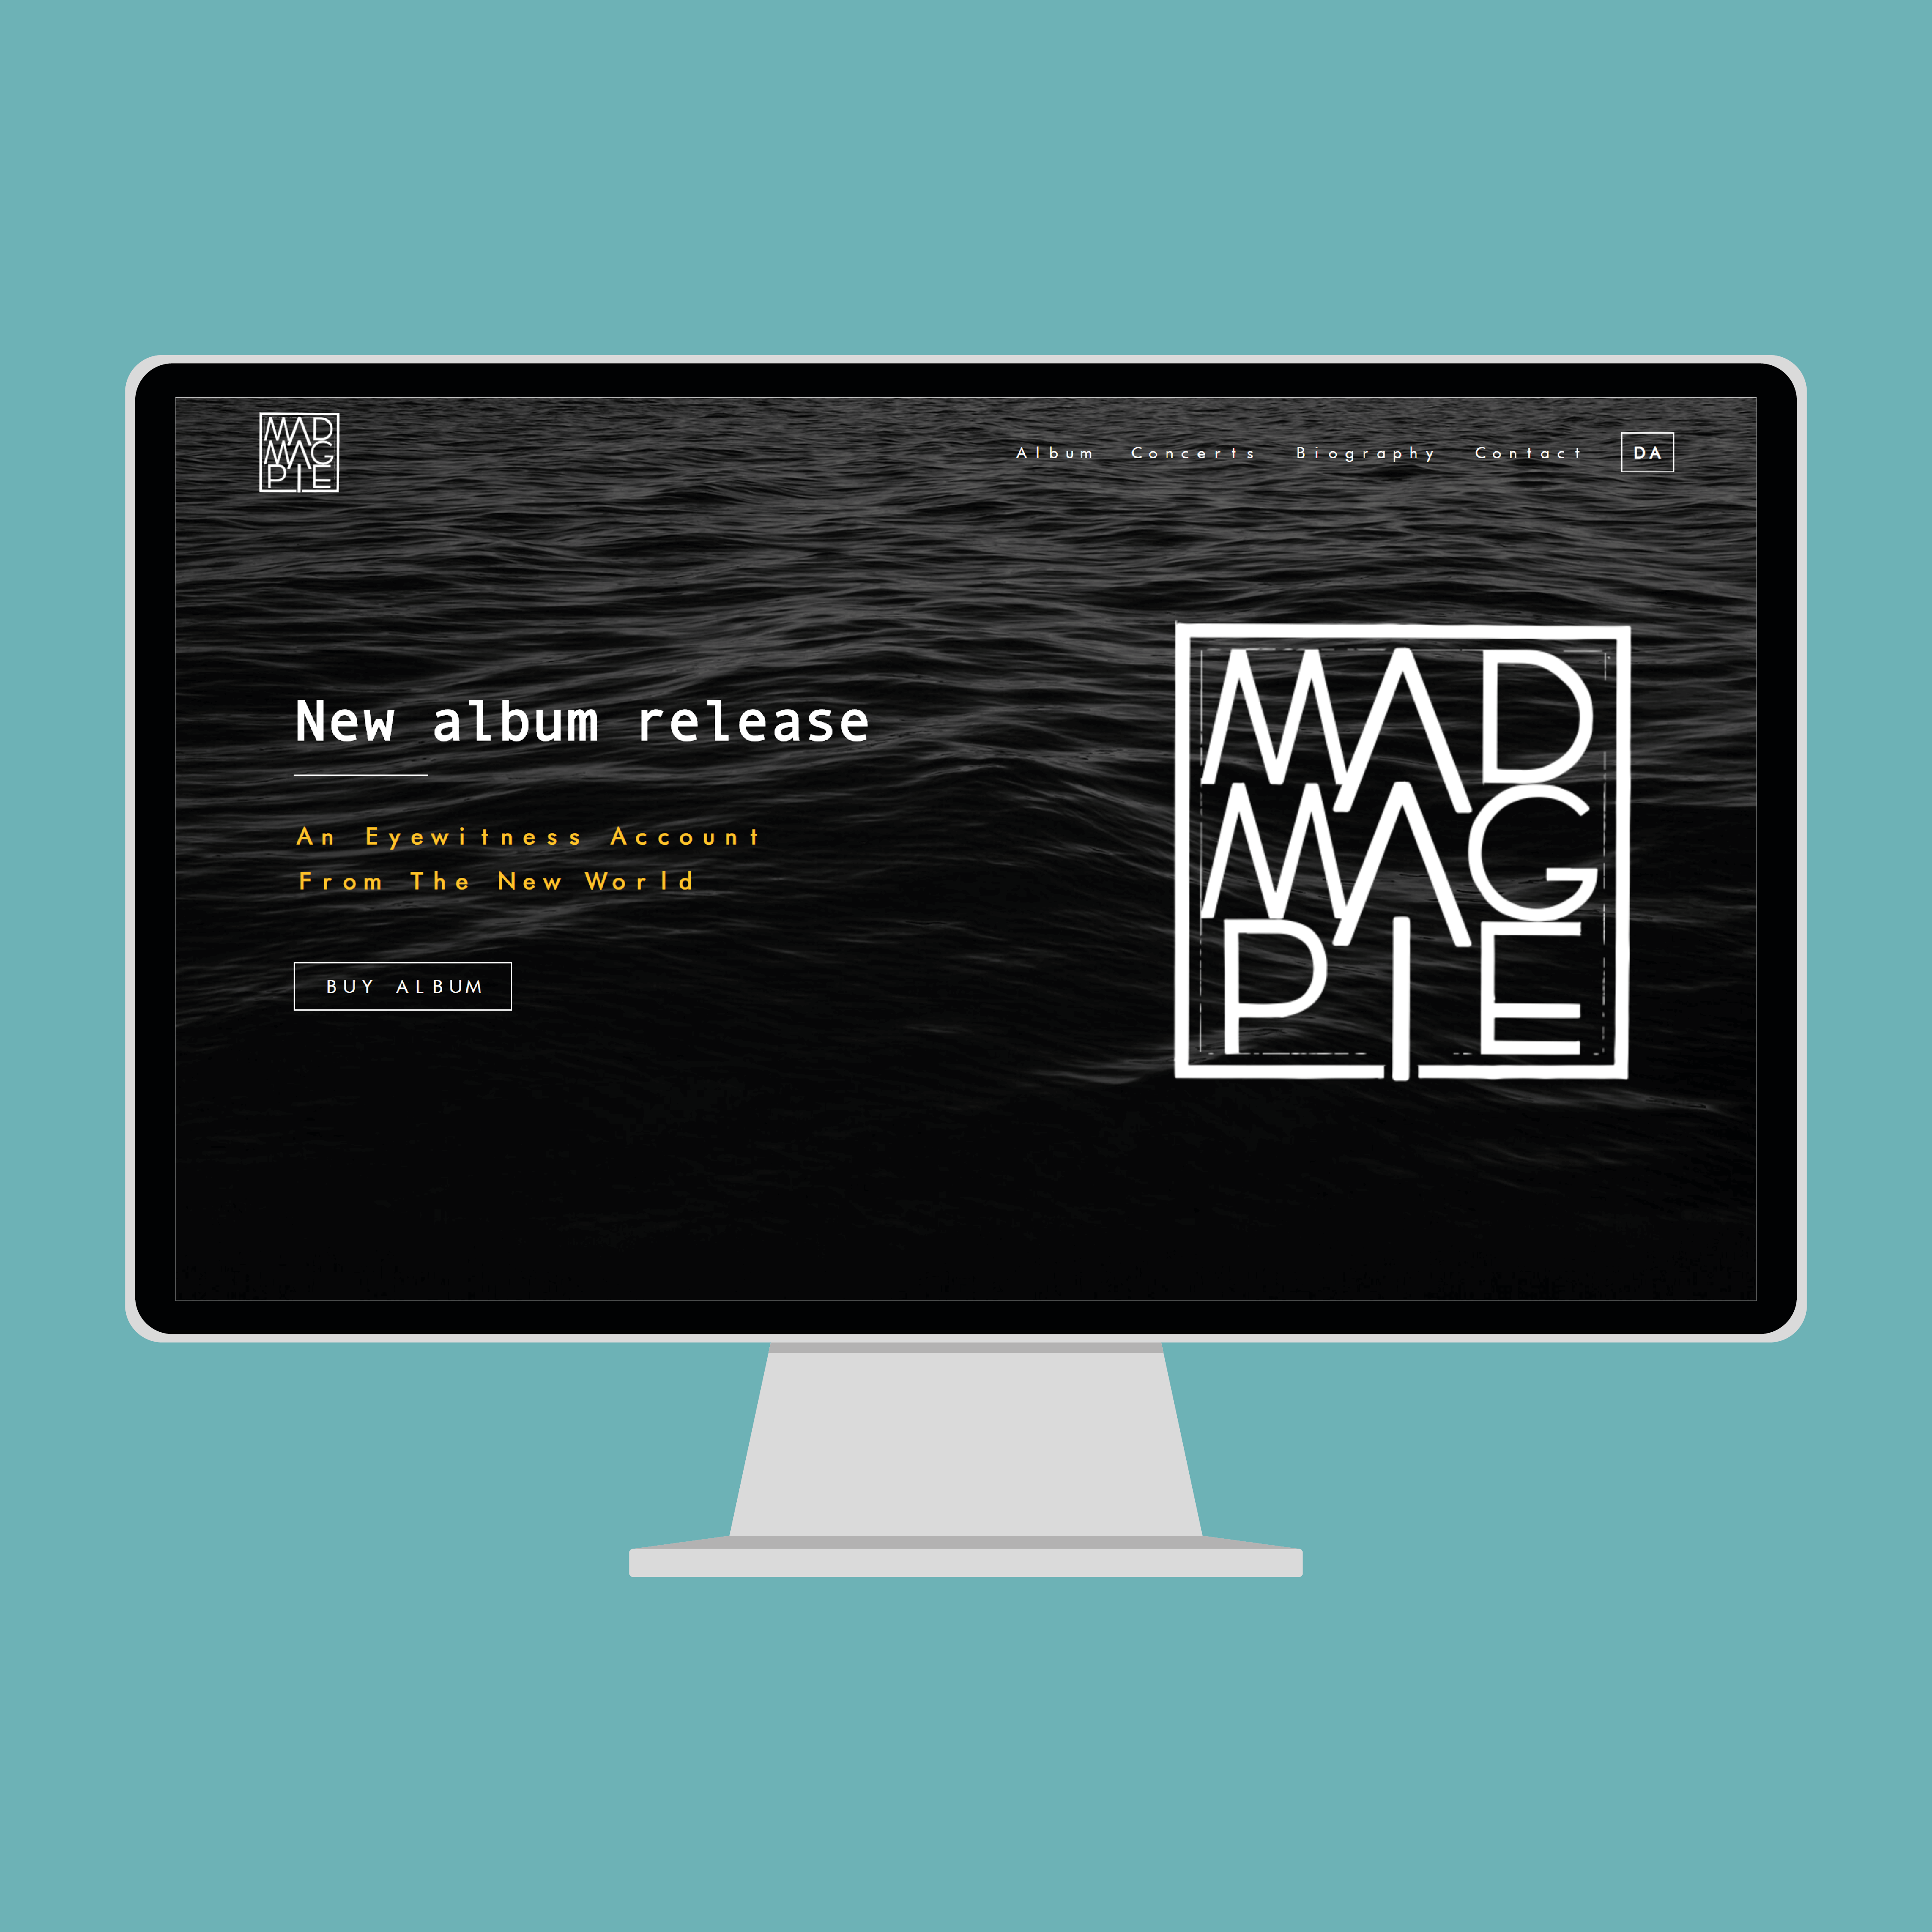 webdesign_17